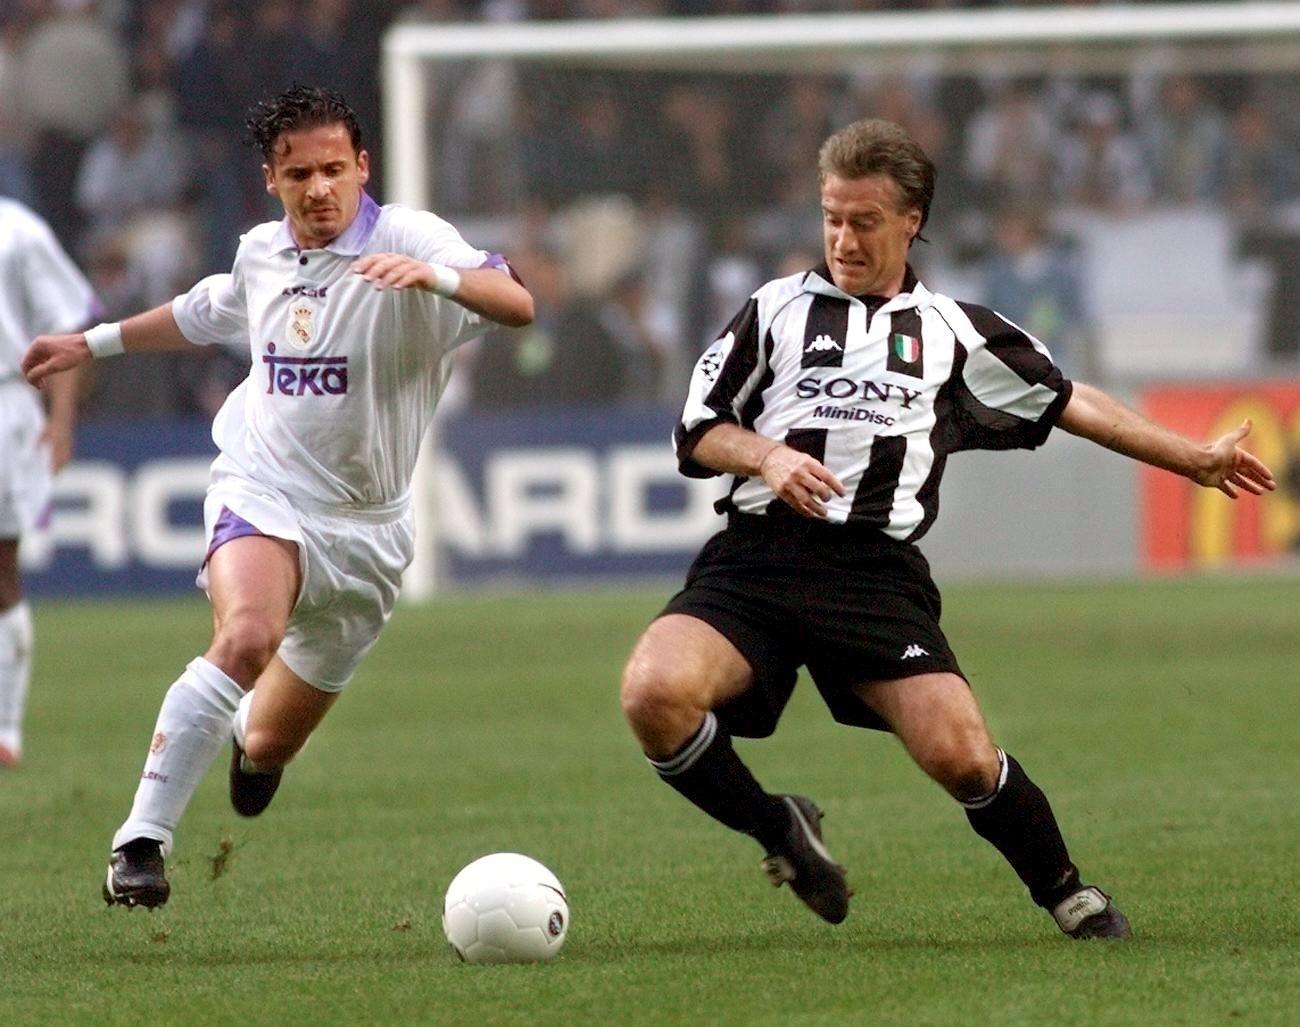 Predrag Mijatovic (esquerda) disputa lance com Didier Deschamps na final de 1998 entre Real Madrid e Juventus